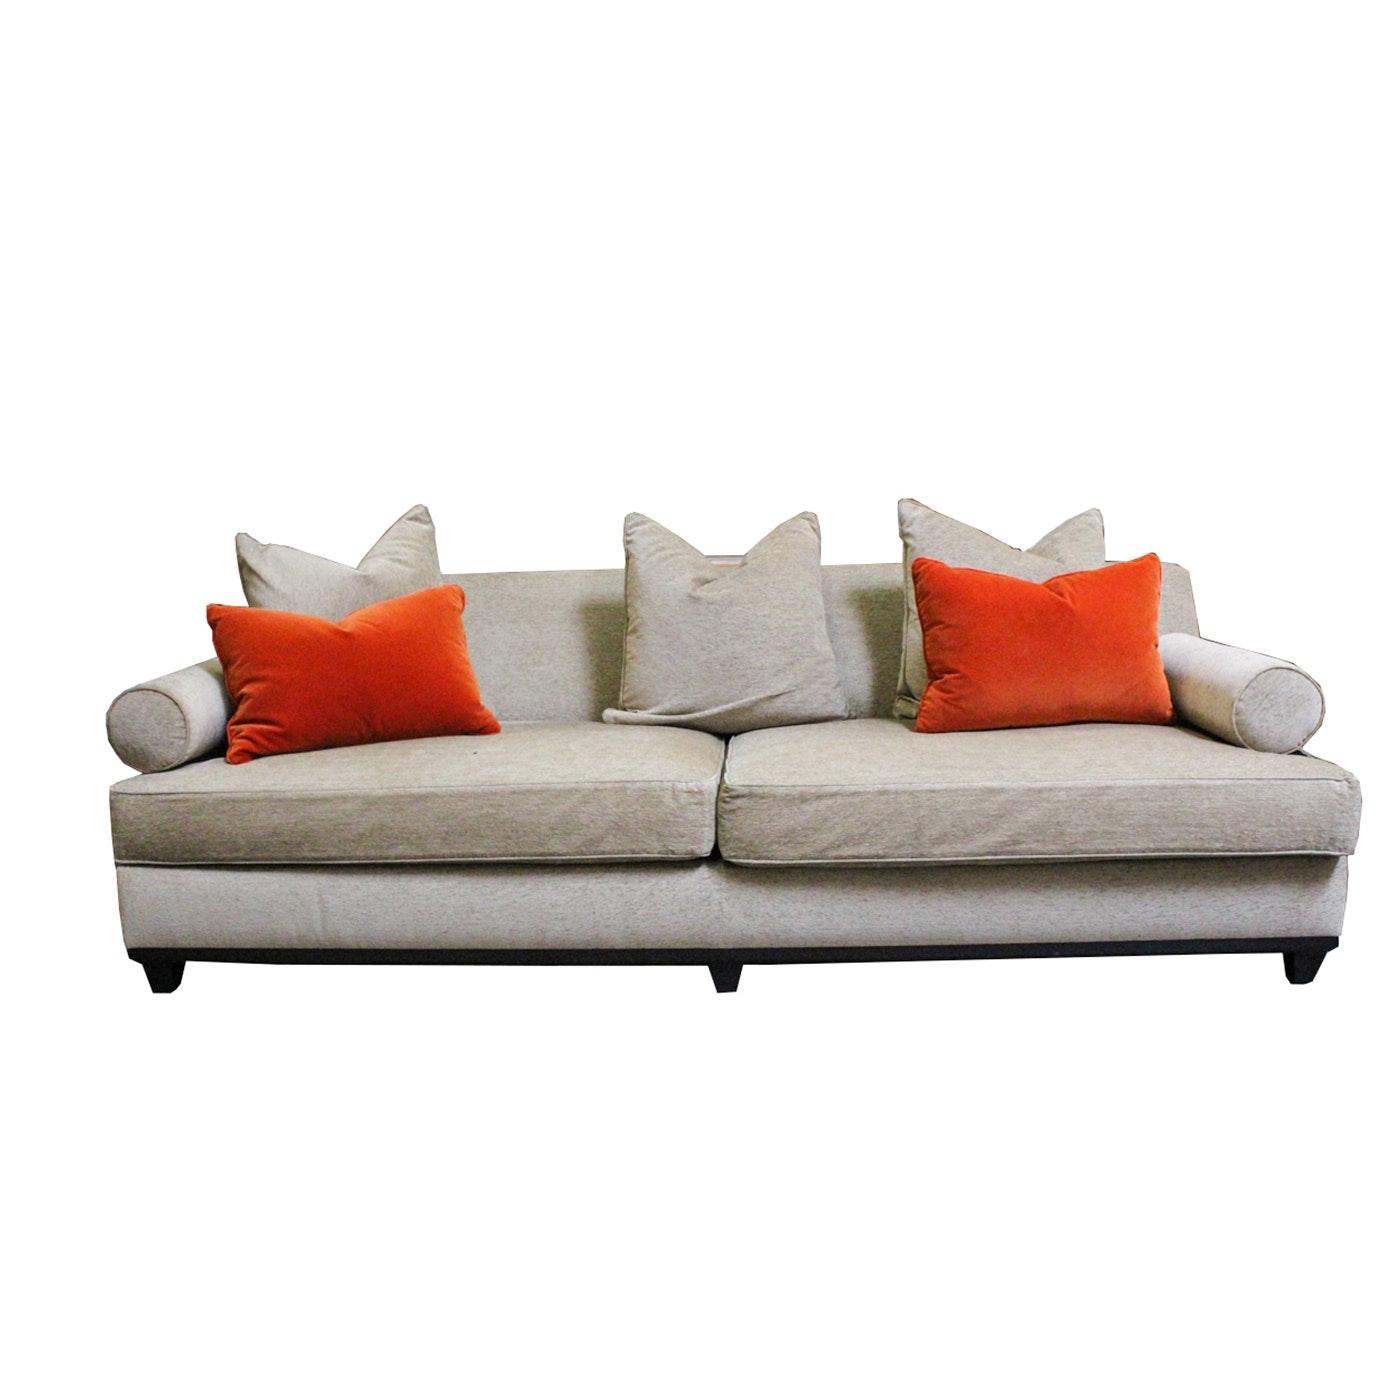 Armless Sofa Belgian Petite Roll Arm Upholstered Armless Sofa